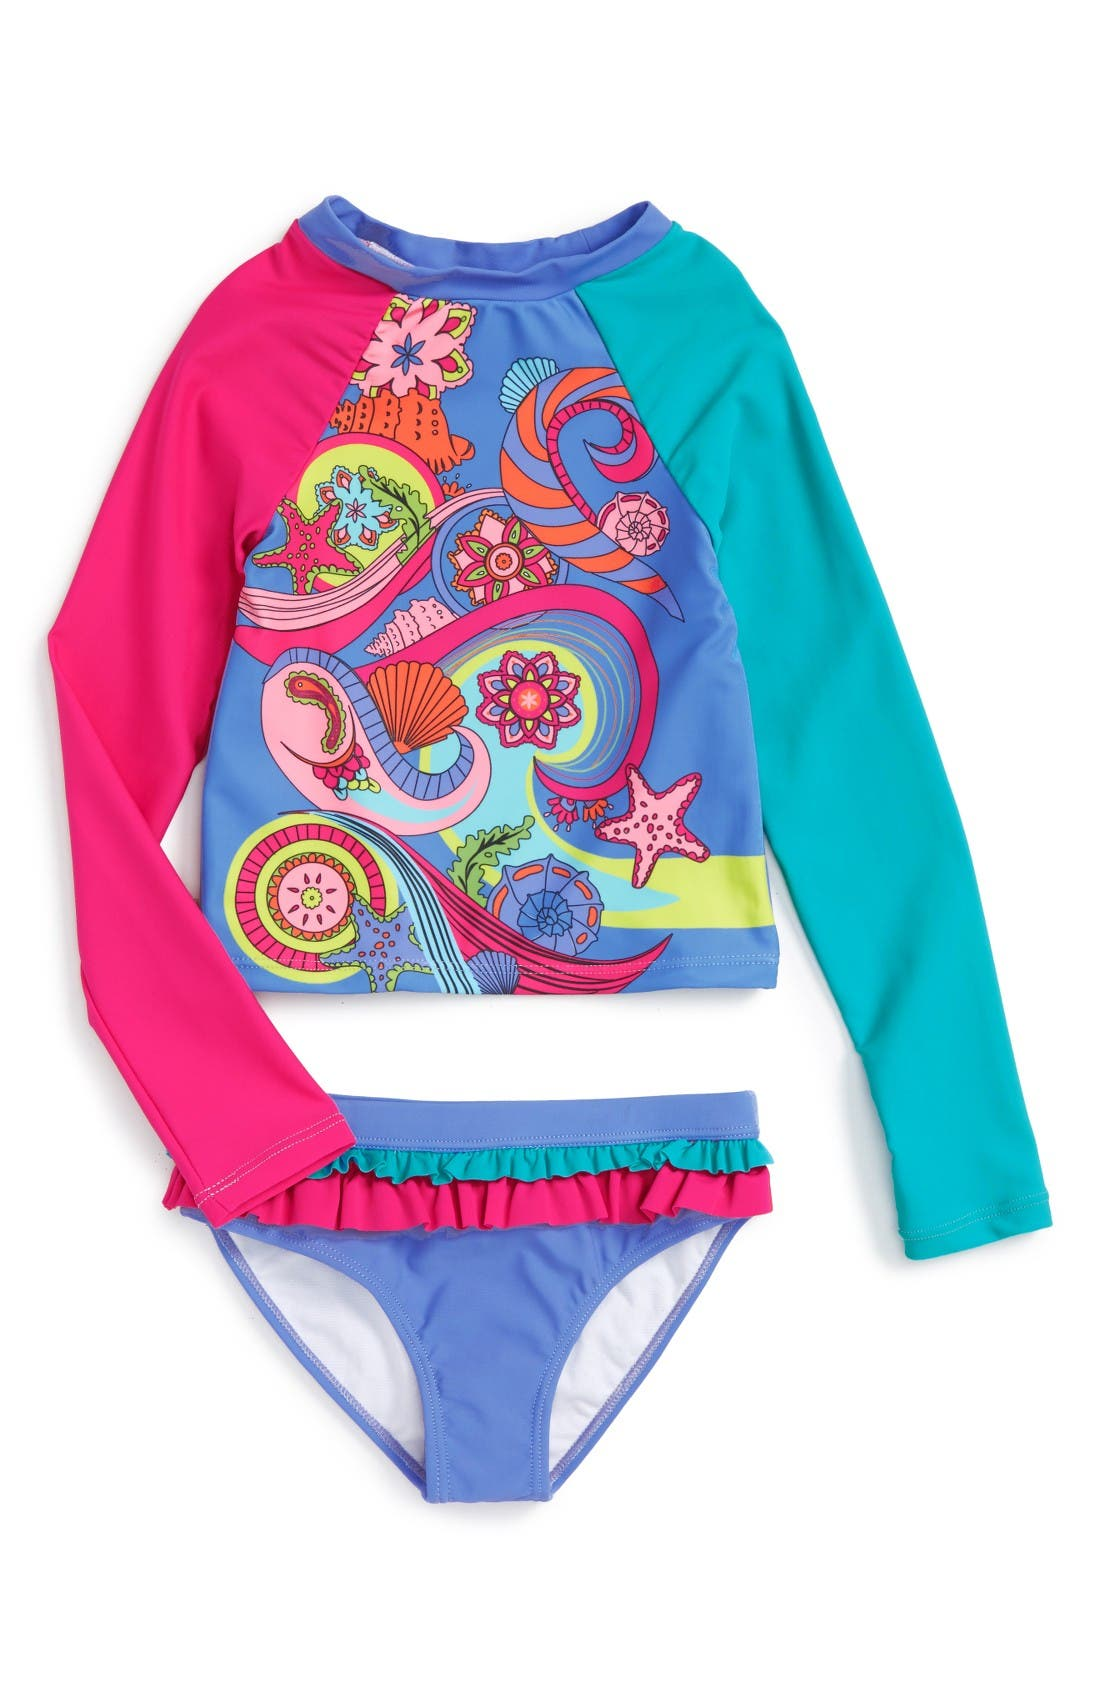 LIMEAPPLE Trixie Two-Piece Rashguard Swimsuit